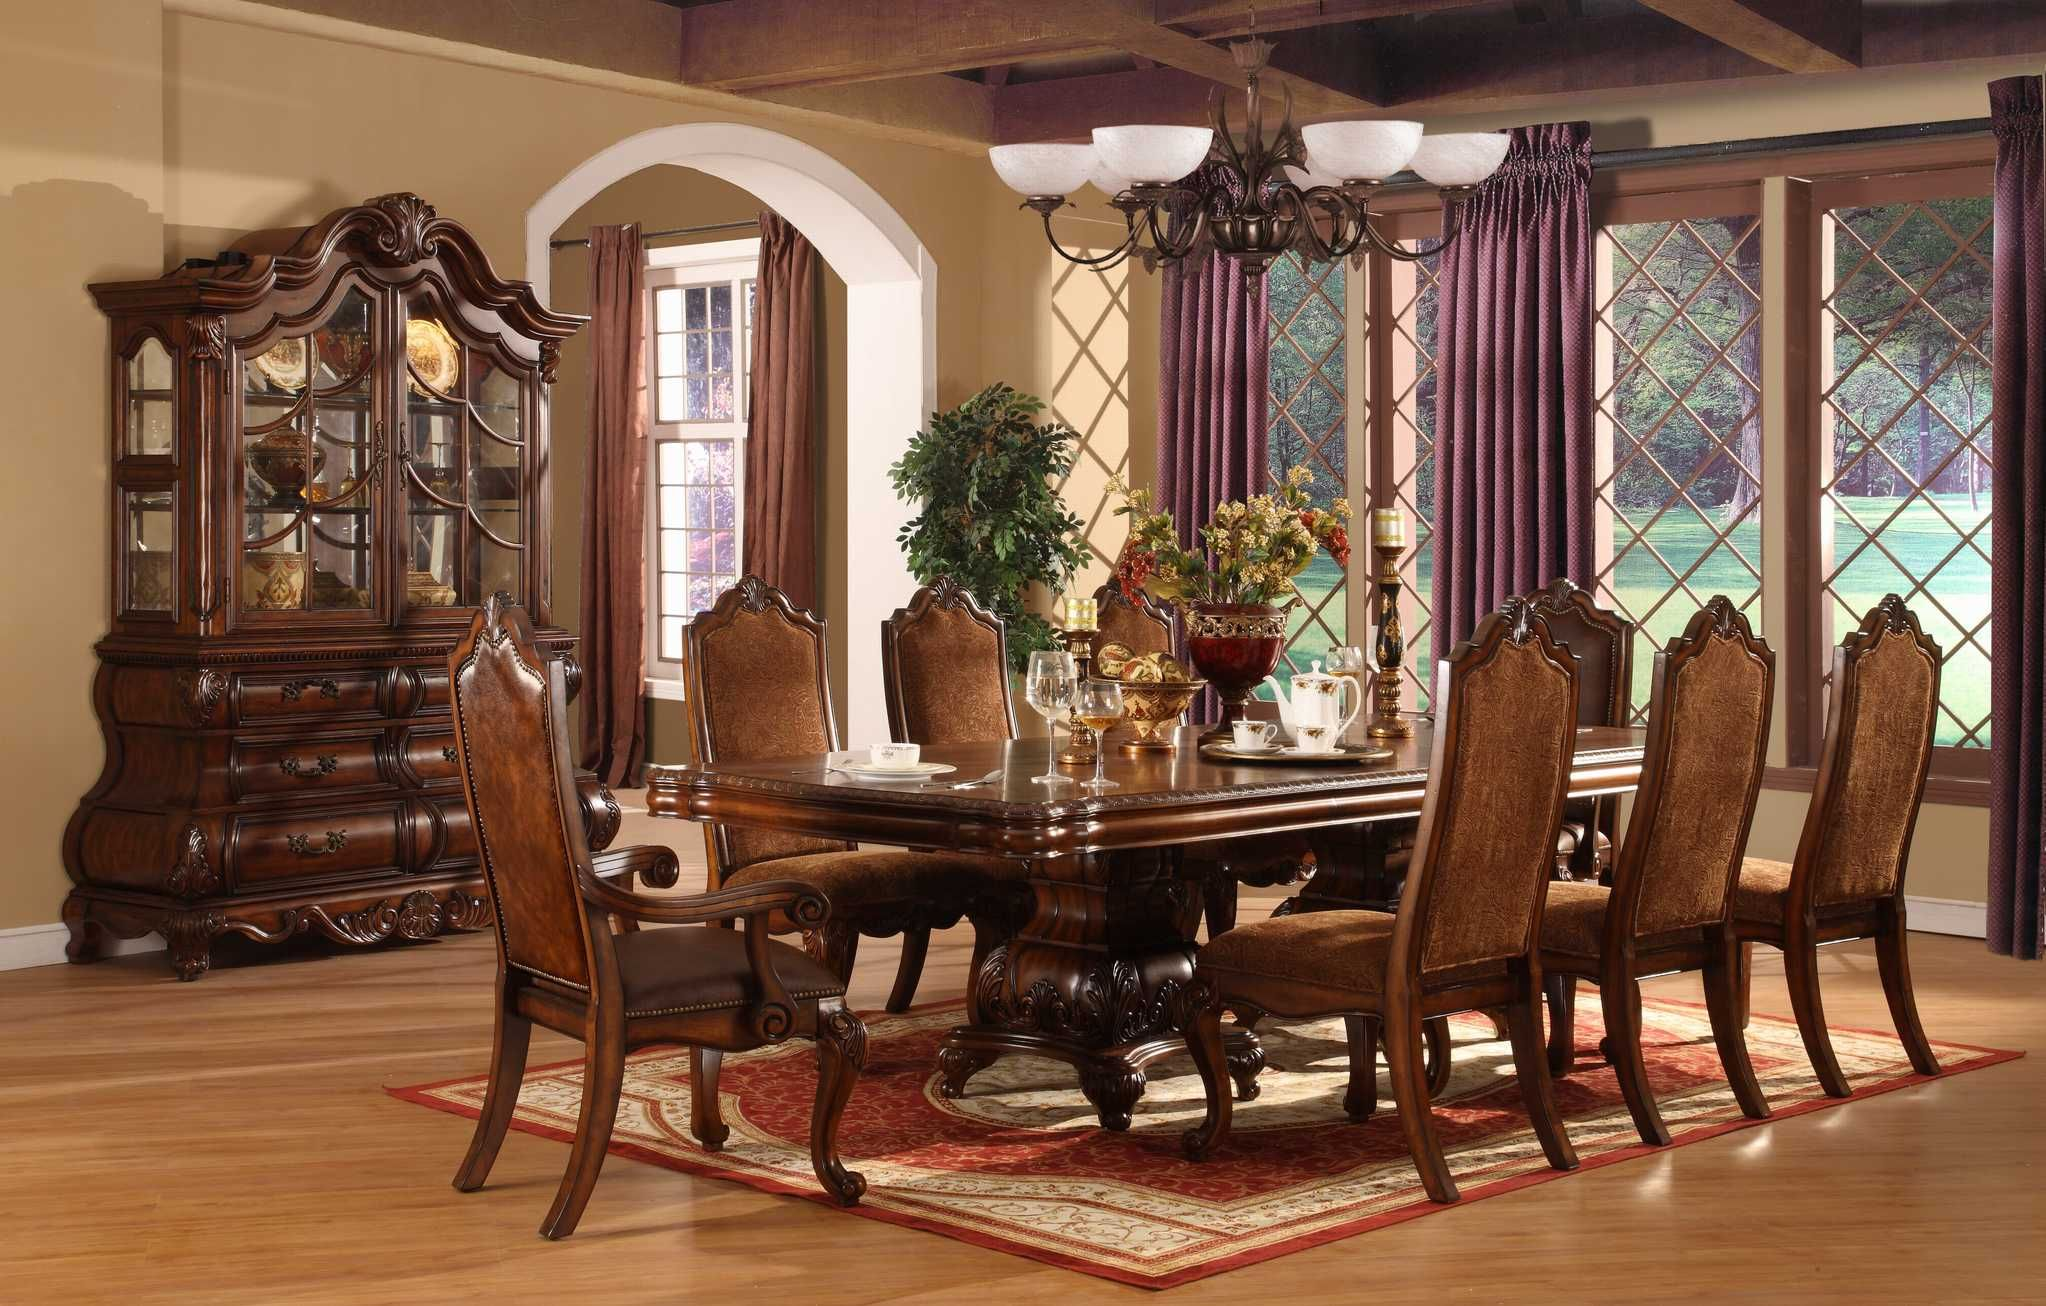 Beautifulformal Dining Room Sets Wooden Bams Ceiling Laminate Floor Mycyfi Com Dining Room Decor Elegant Formal Dining Room Sets Formal Dining Room Furniture